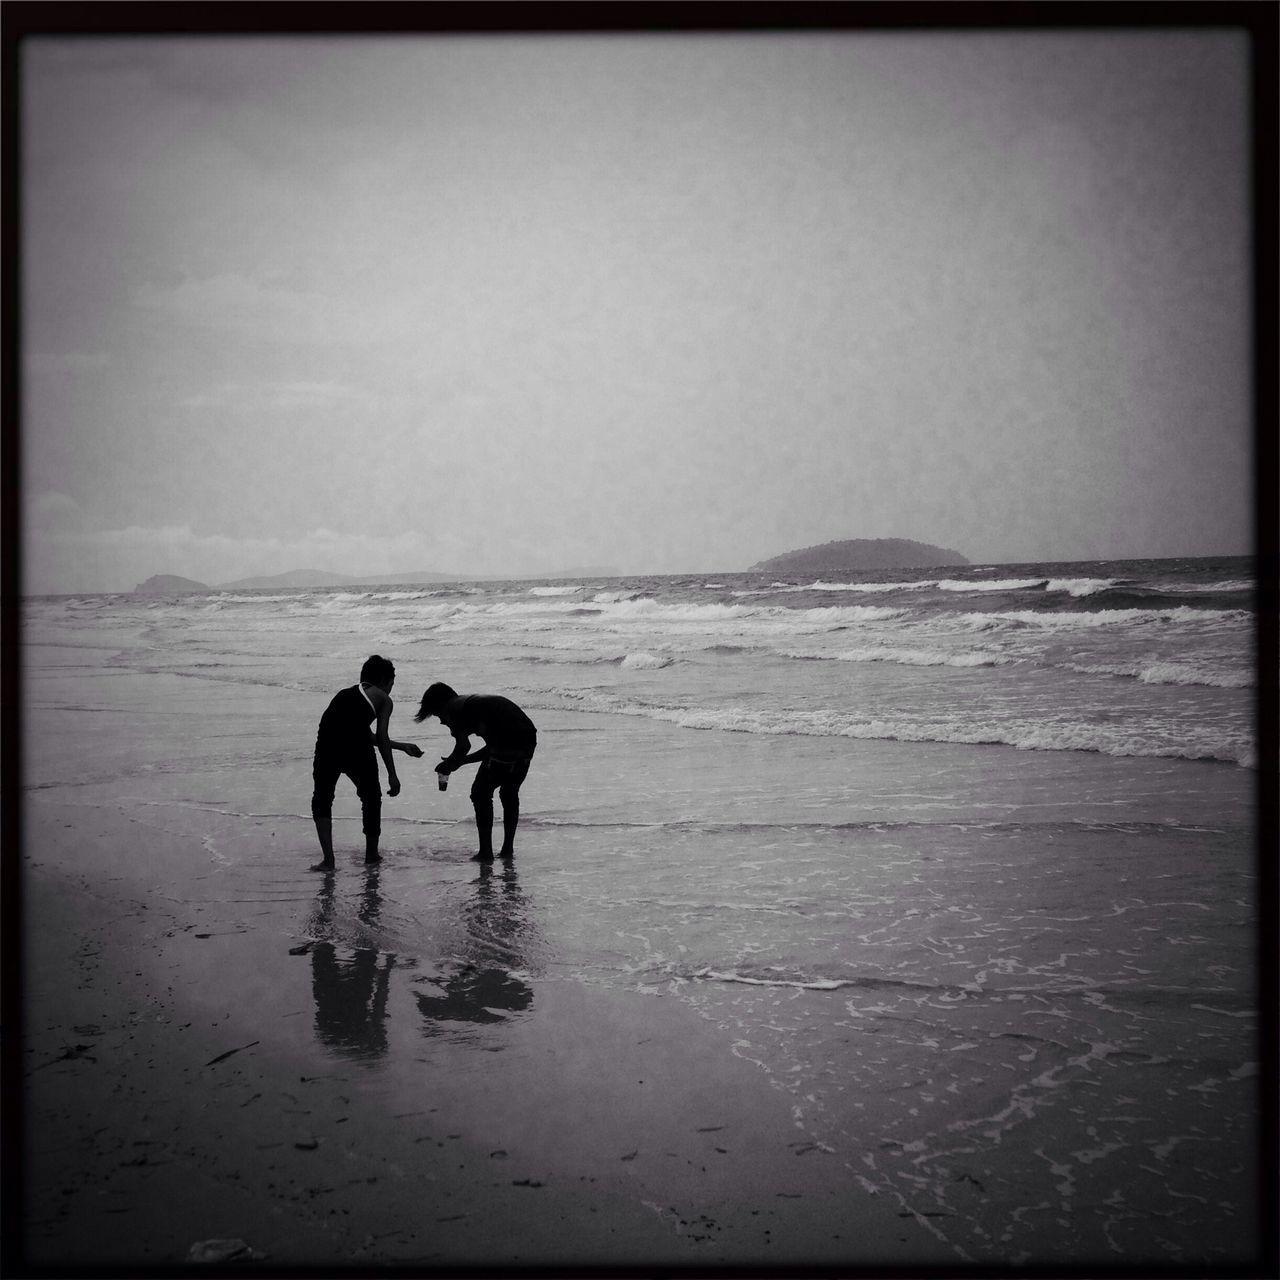 Two men collecting seashells on beach